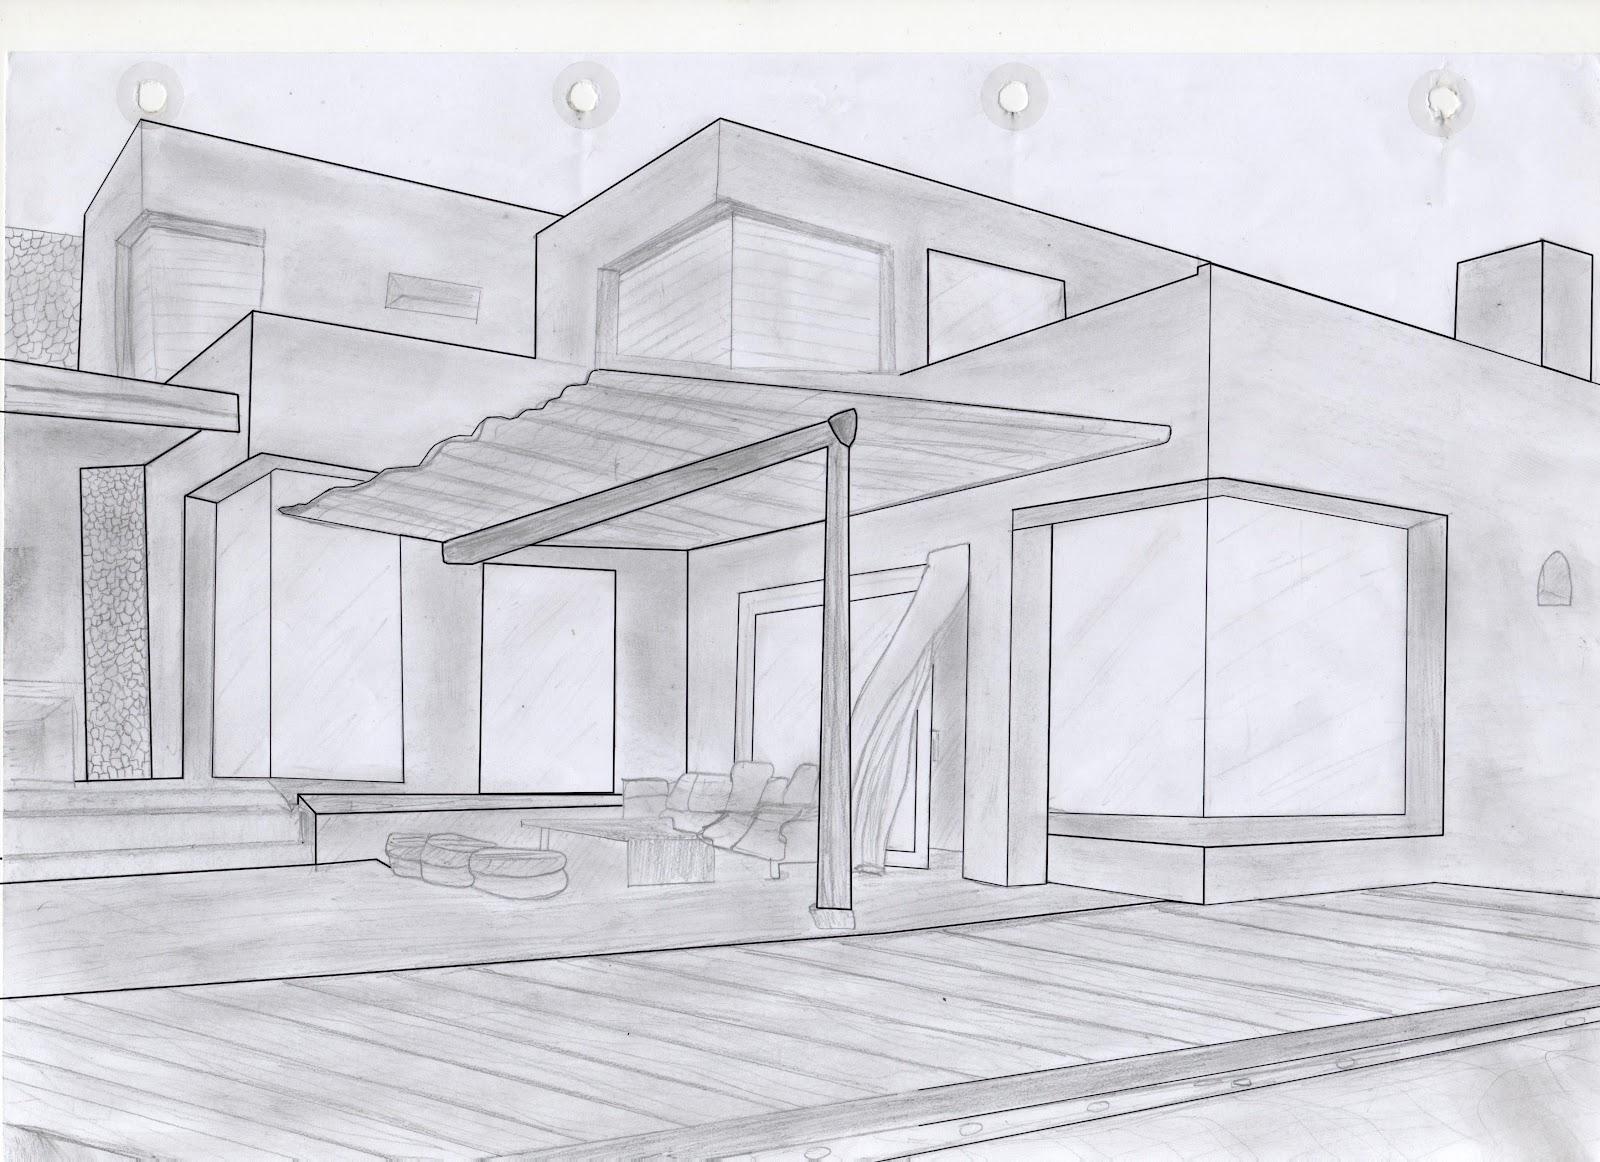 Dibujo y dise o digital casa modular de piedra - Fotos de casas para dibujar ...